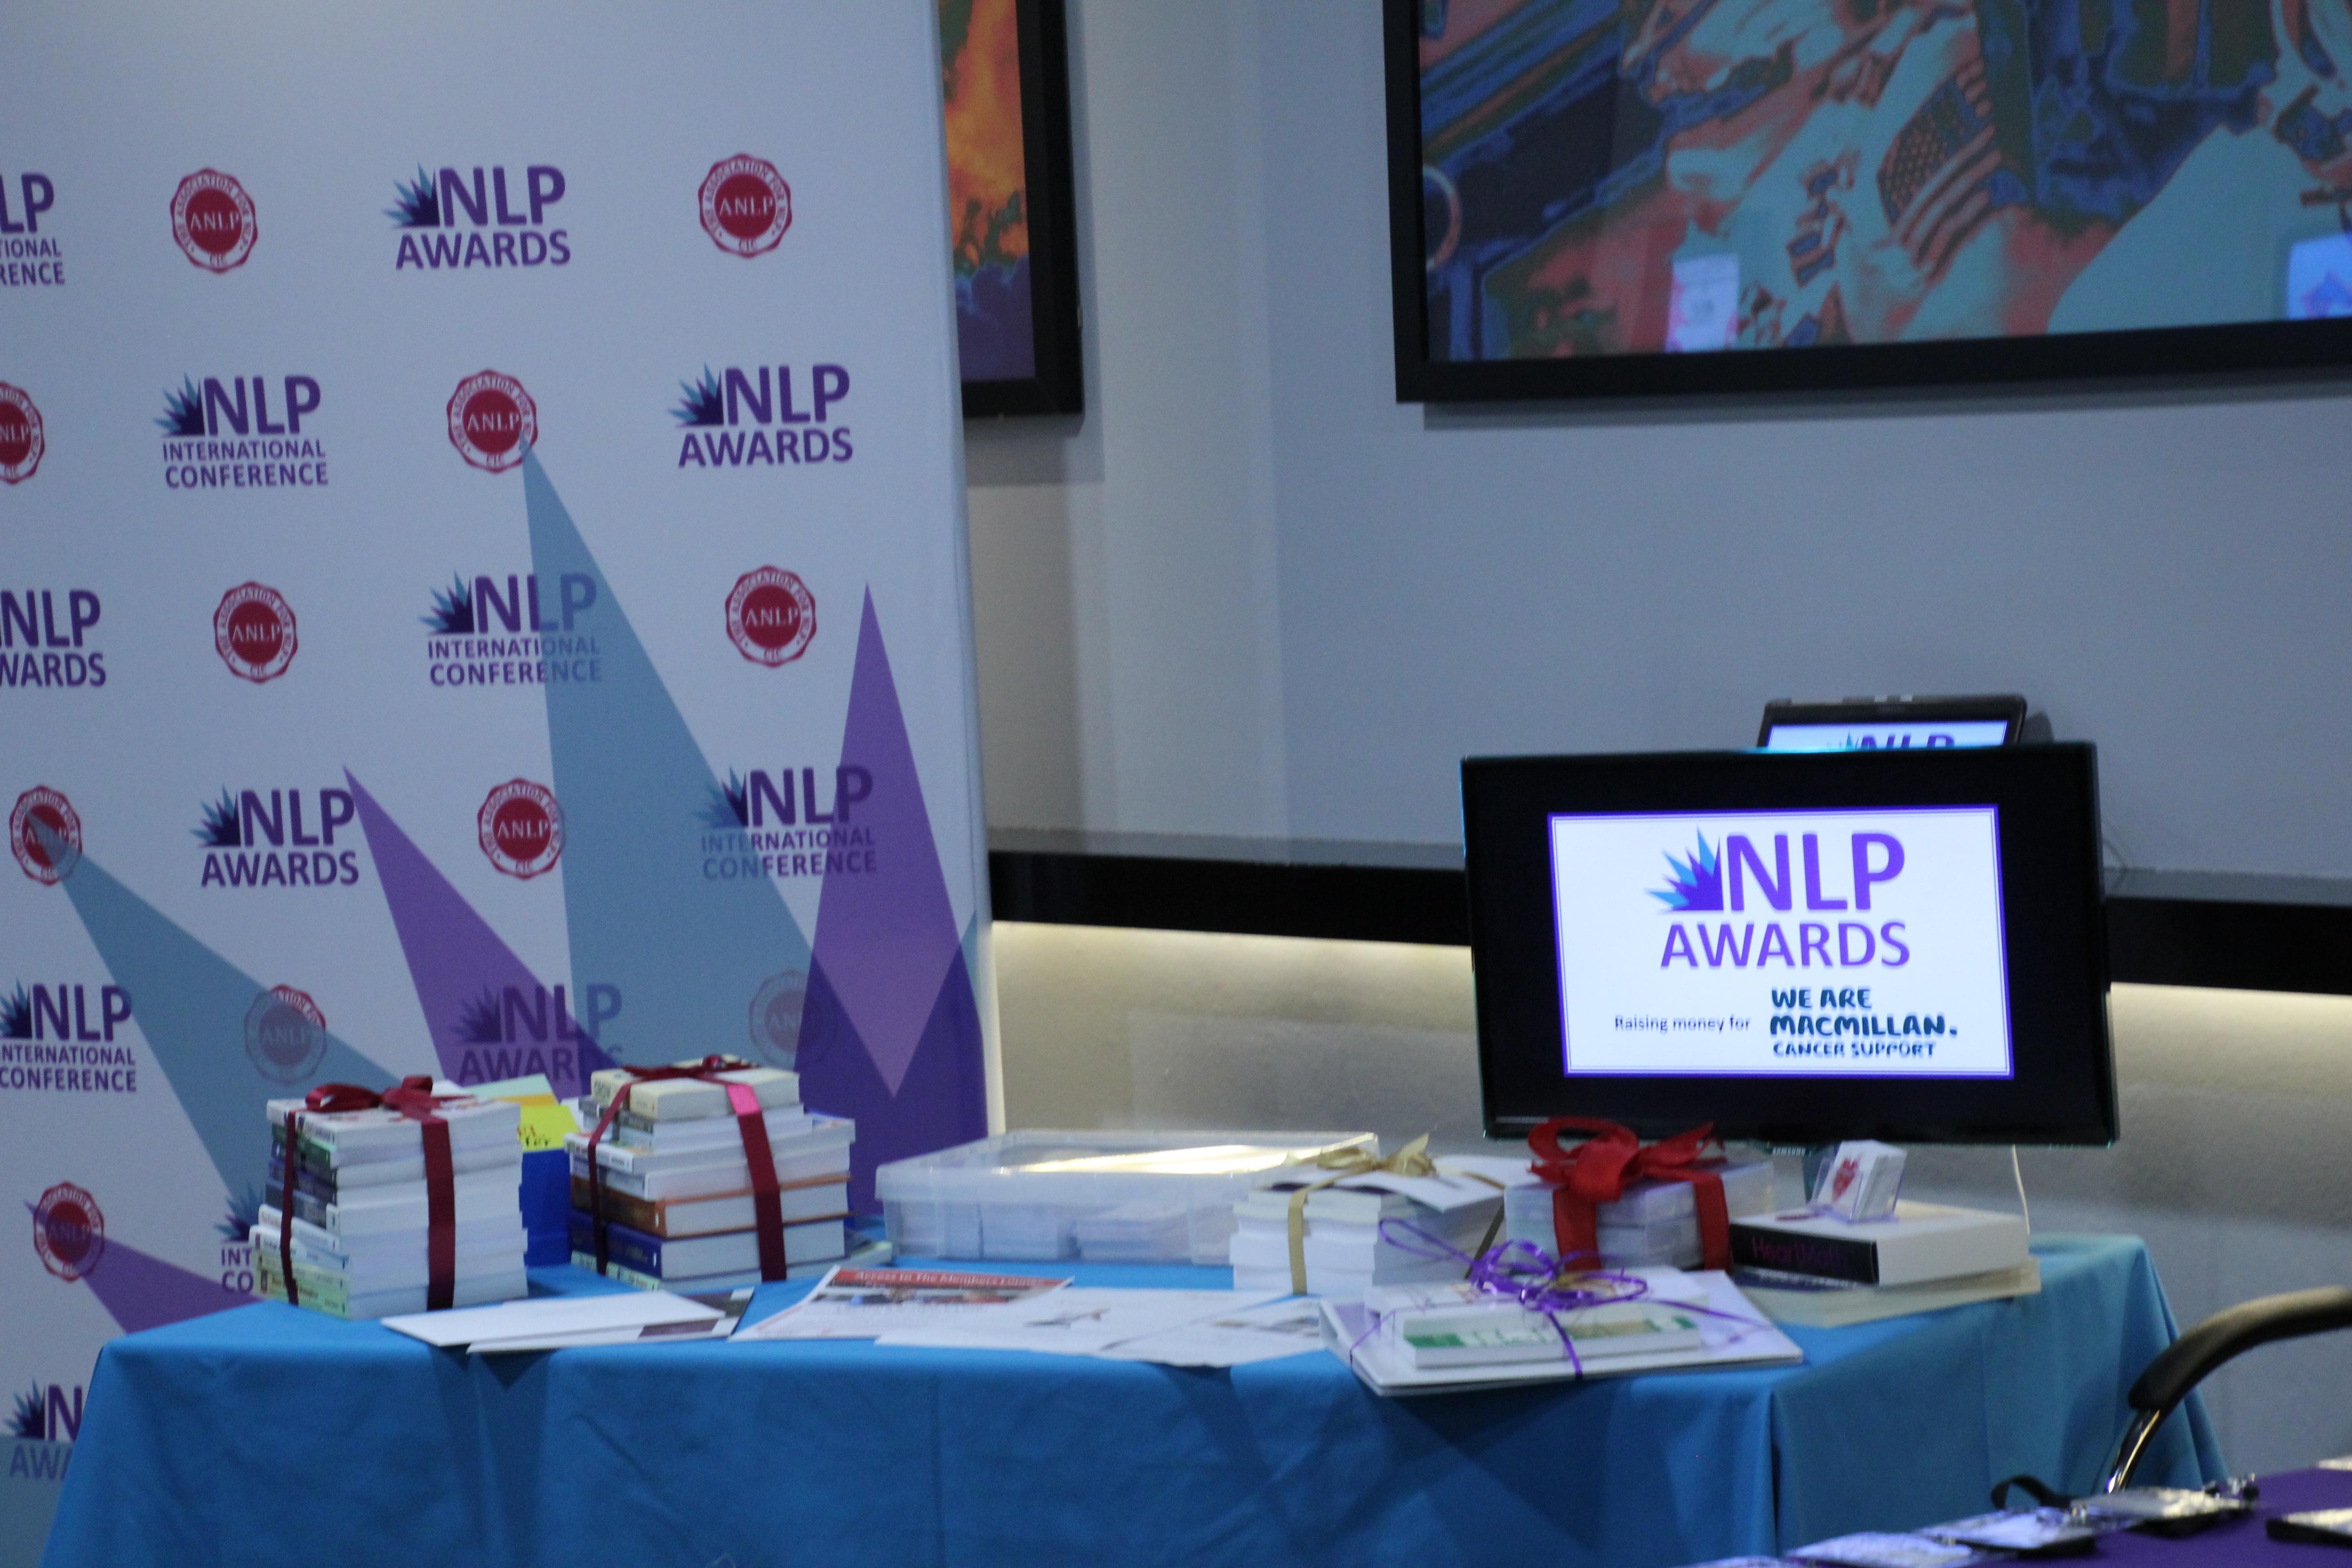 NLP International Conference 2017